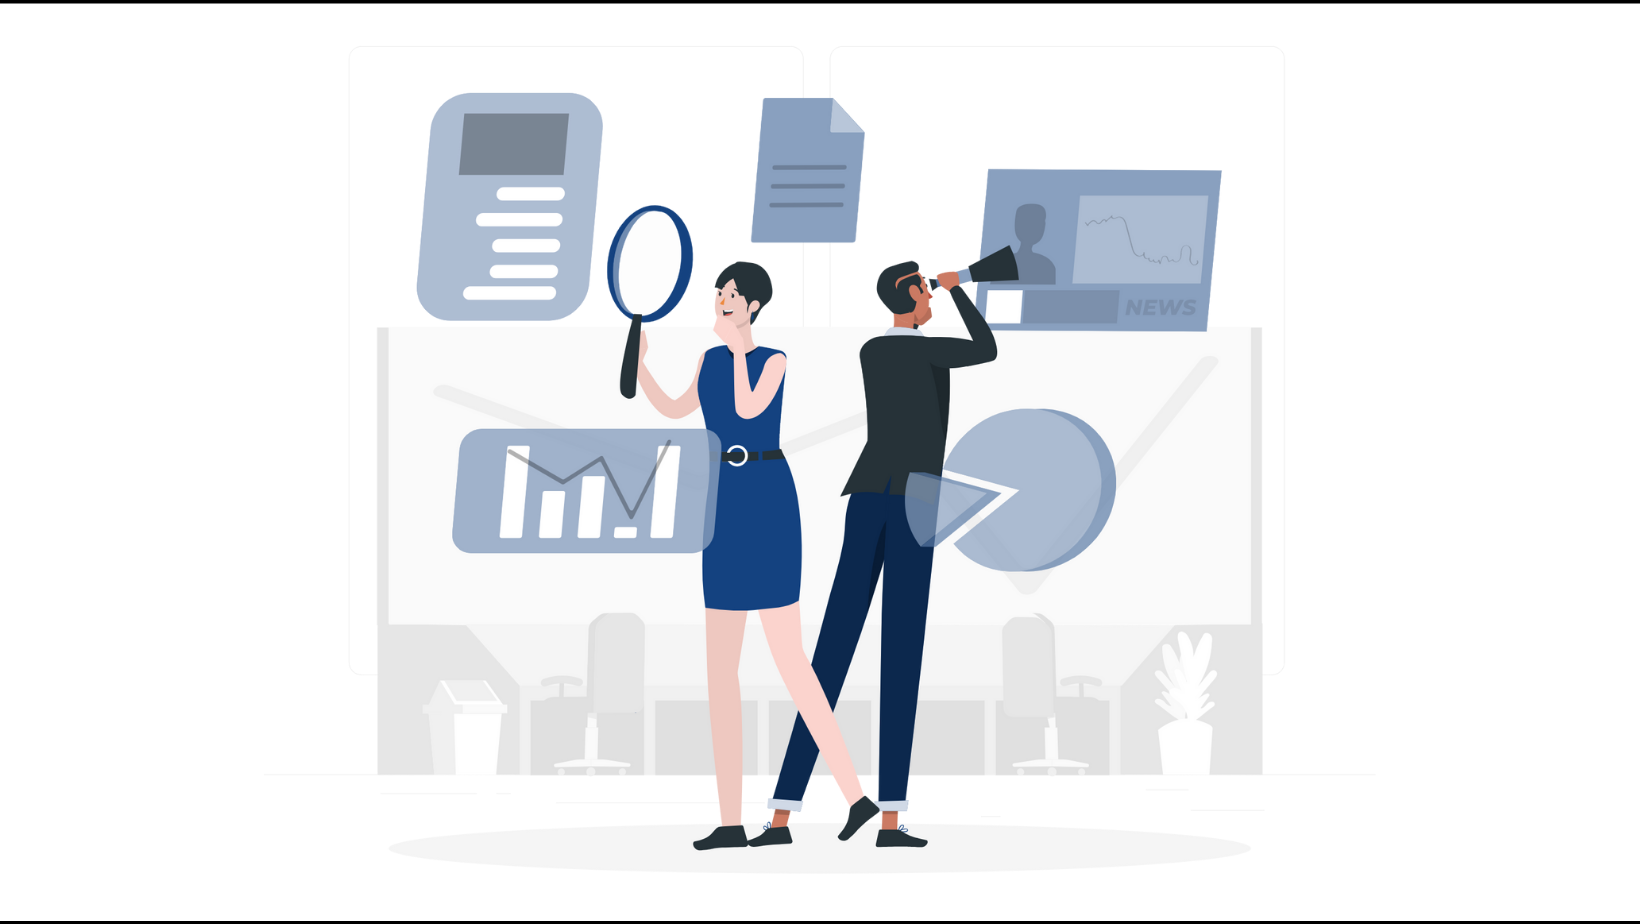 Data-driven culture | Designed by Freepik